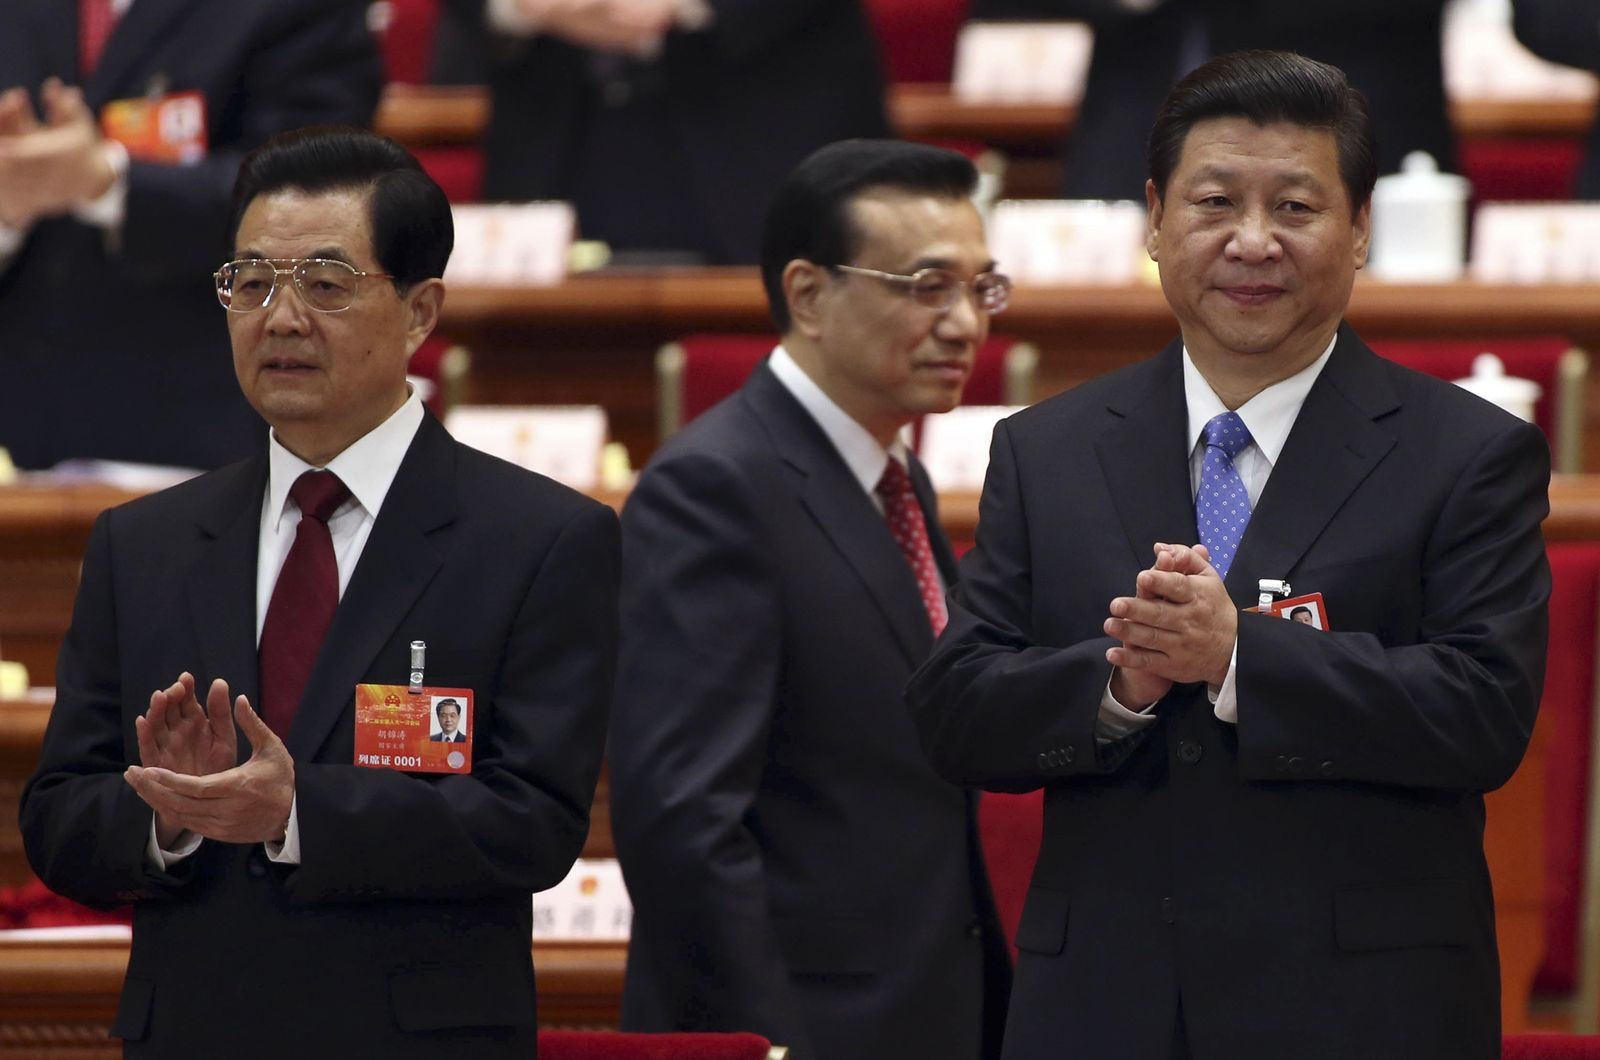 CHINA-PARLIAMENT/